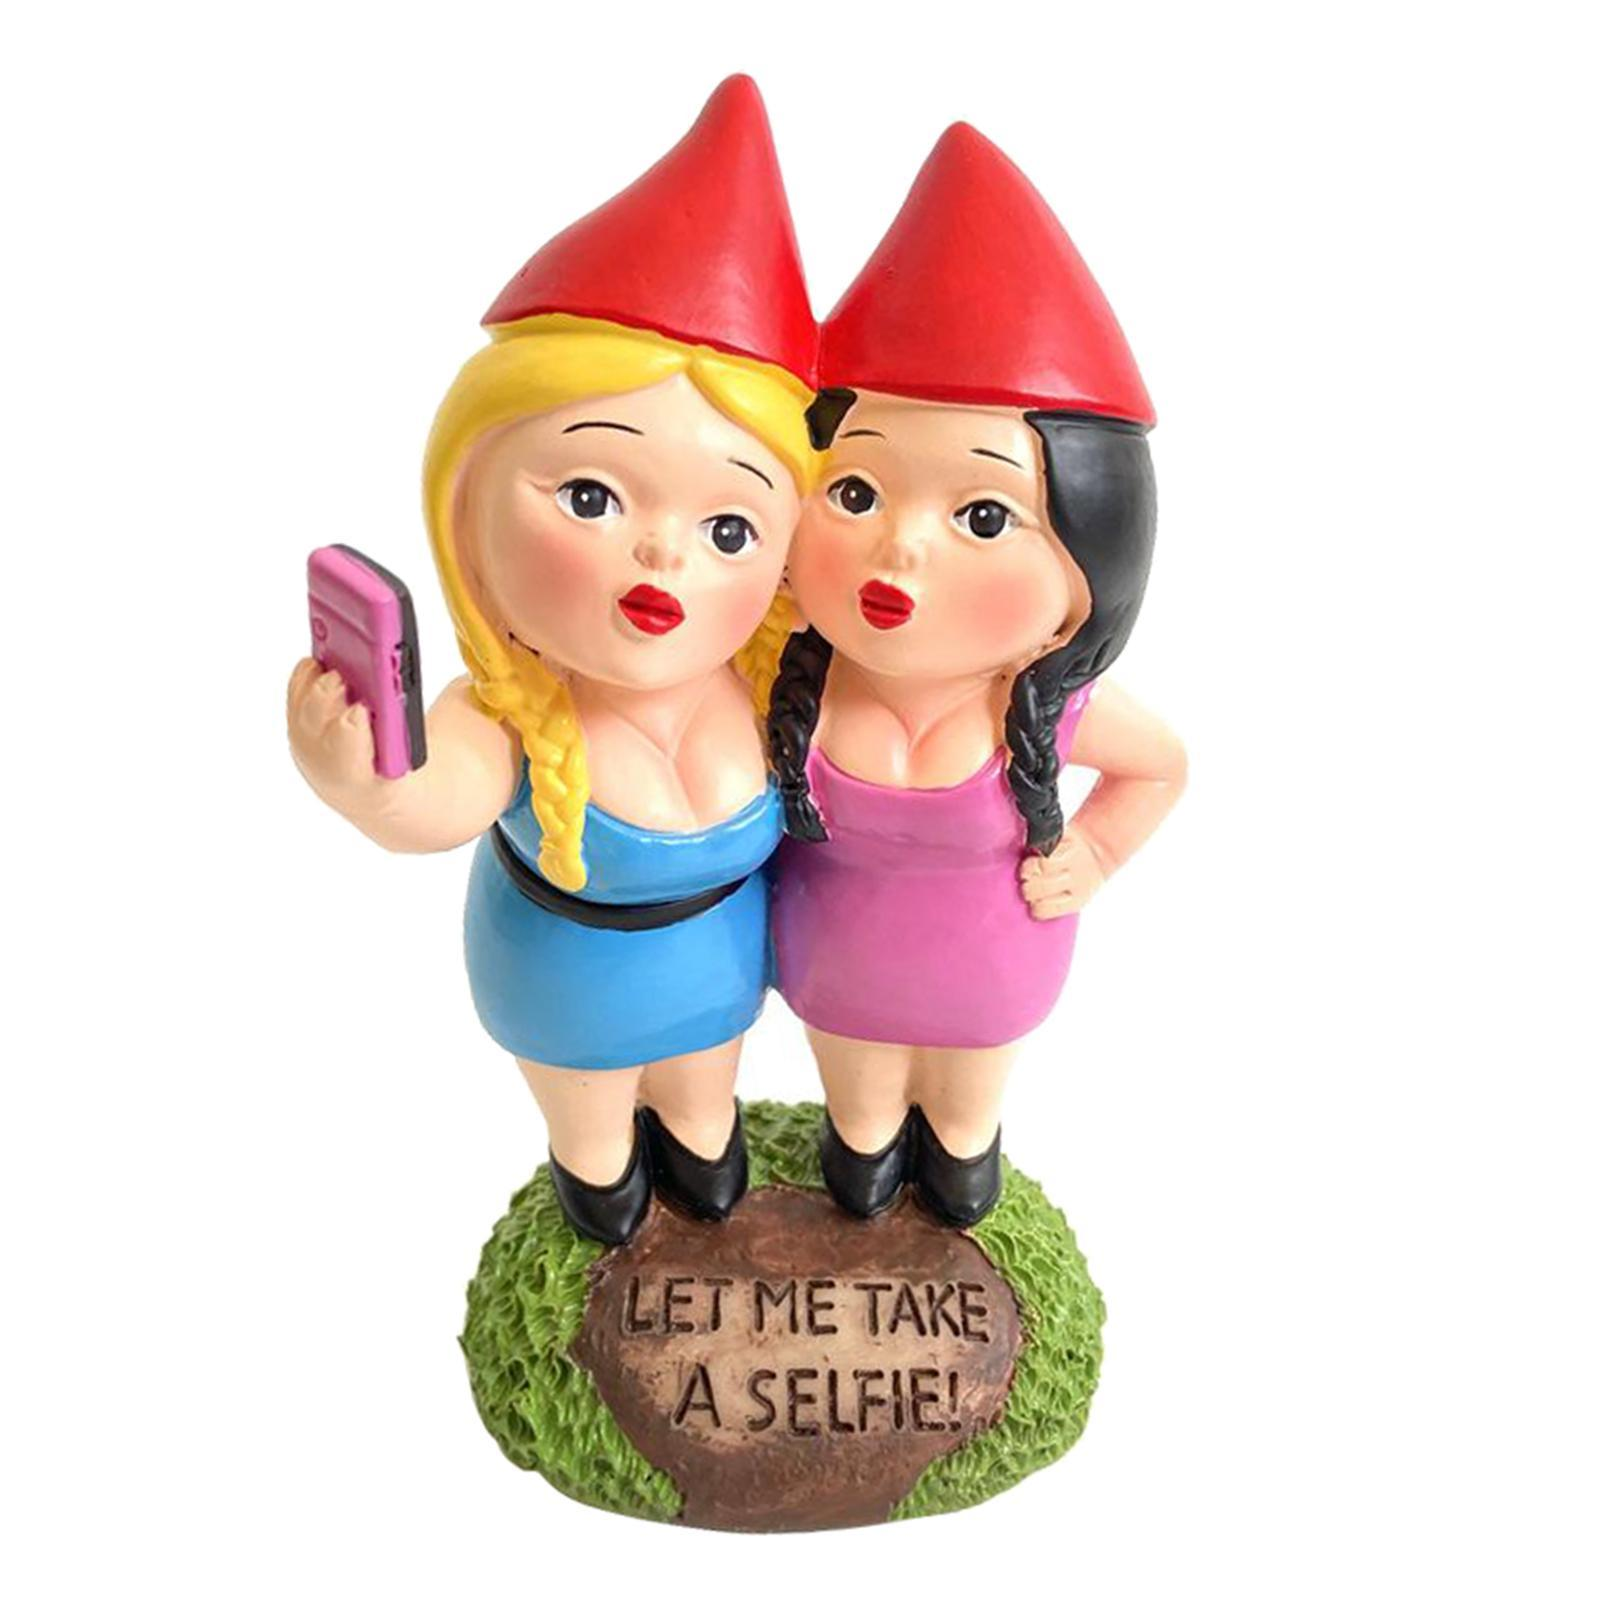 thumbnail 15 - Funny Resin Naughty Garden Gnome Statue Ornaments Villa Home Figurines Decor